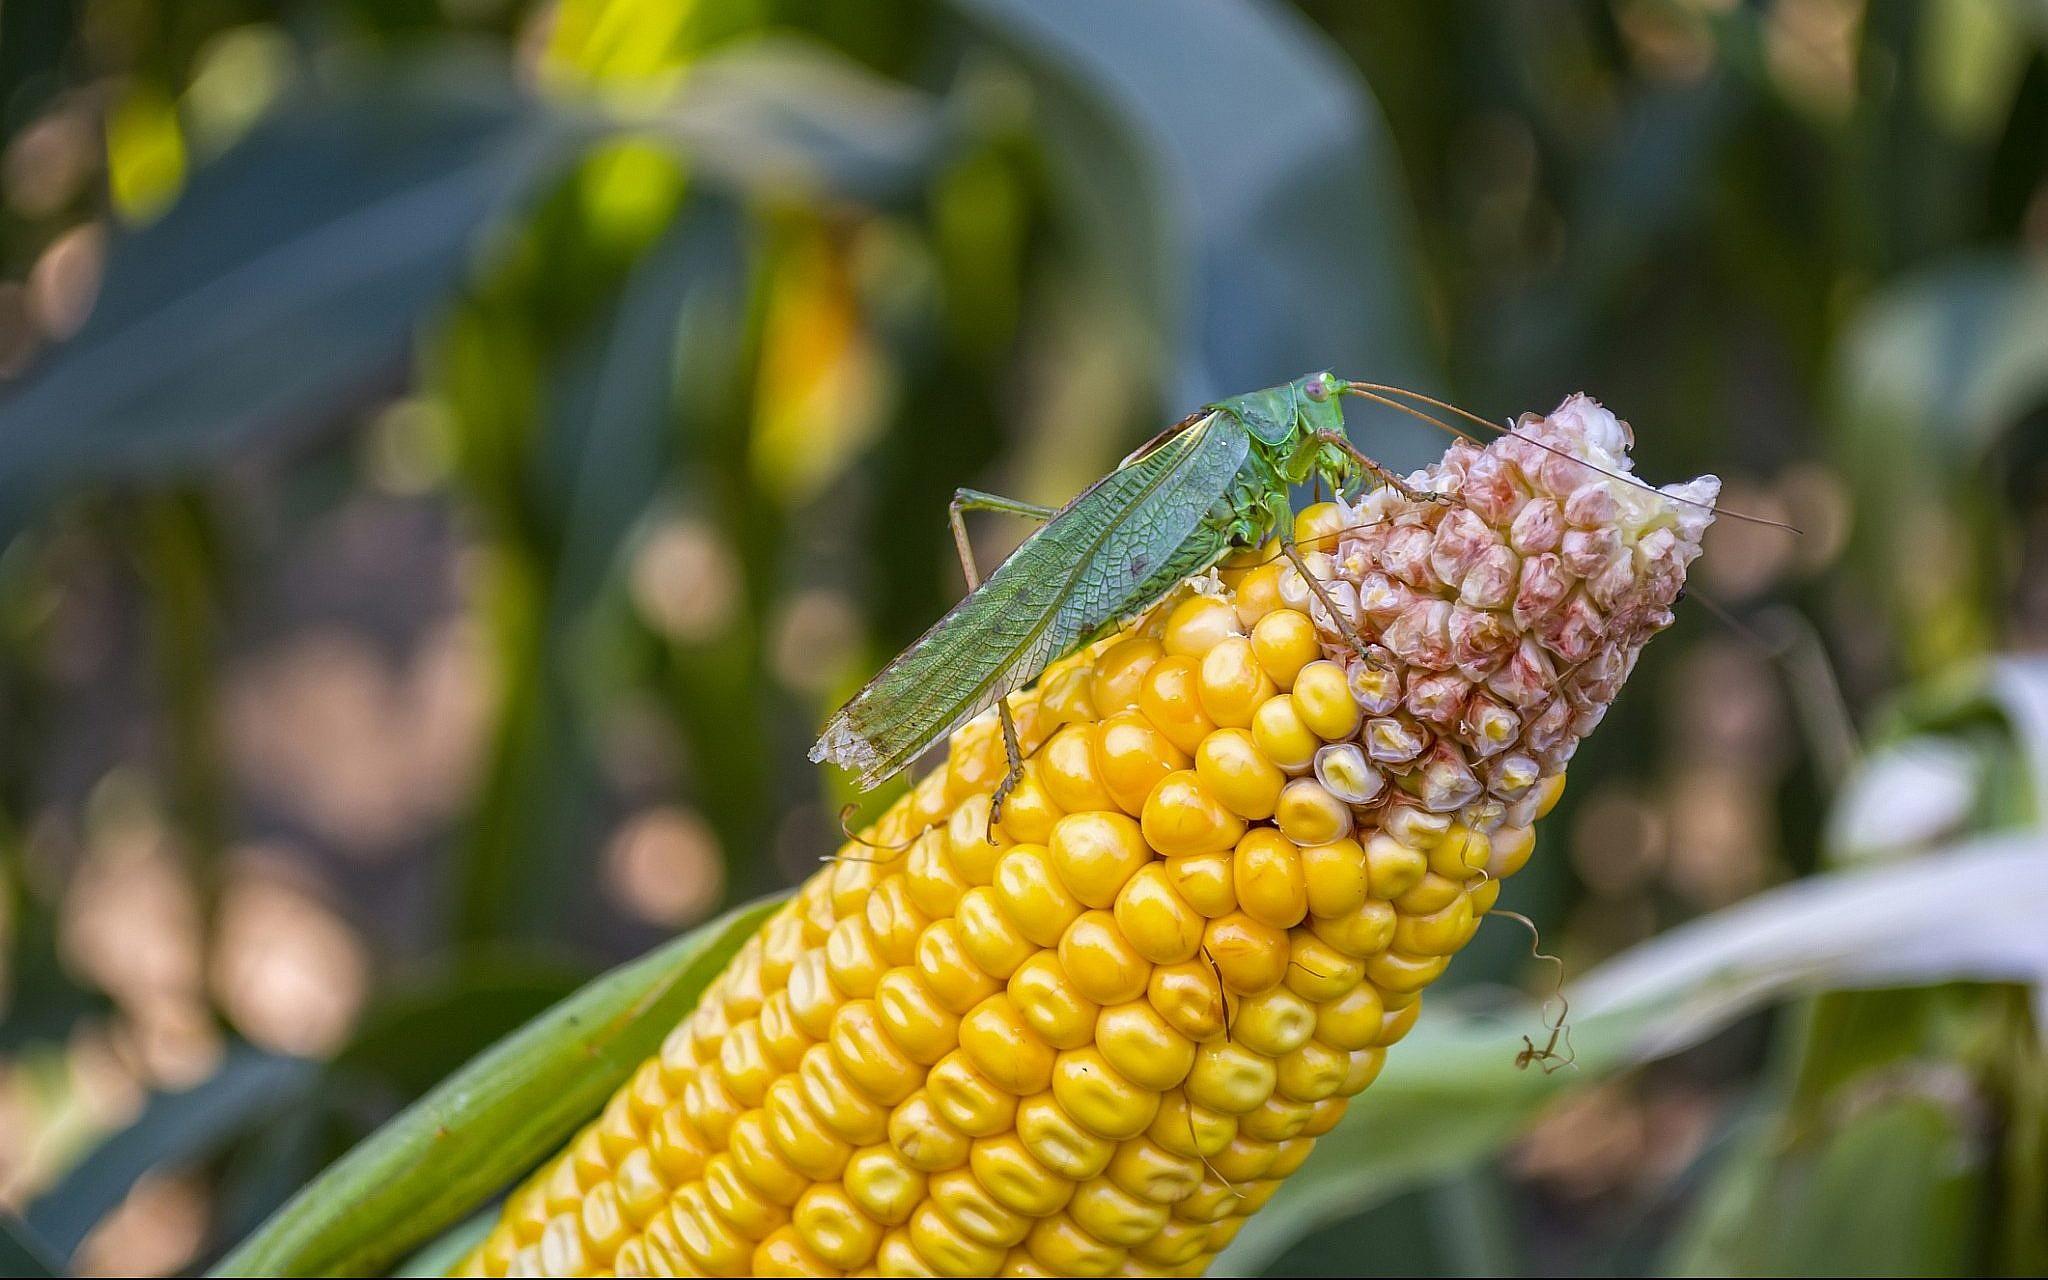 Locusts spotted infesting Israel's southeastern Arava area